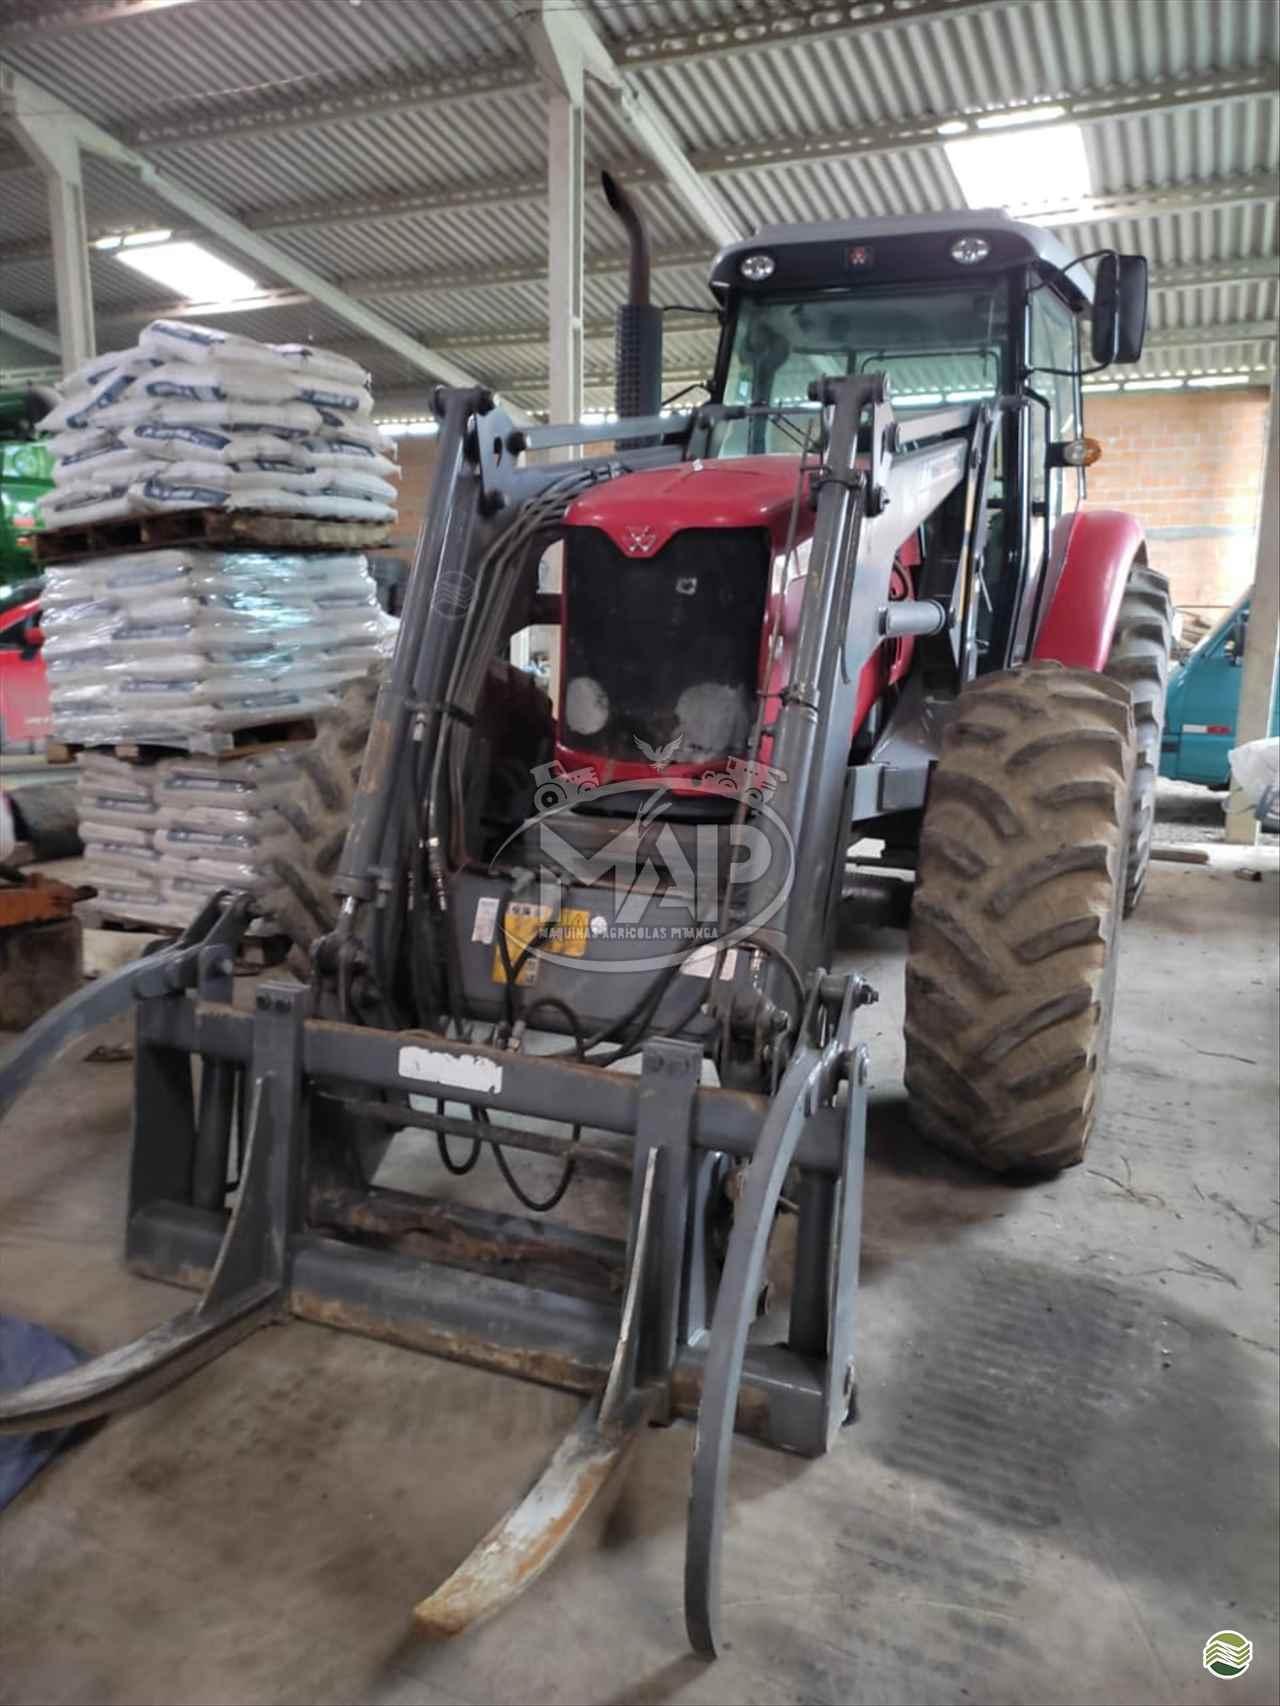 TRATOR MASSEY FERGUSON MF 7140 Tração 4x4 Máquinas Agrícolas Pitanga PITANGA PARANÁ PR